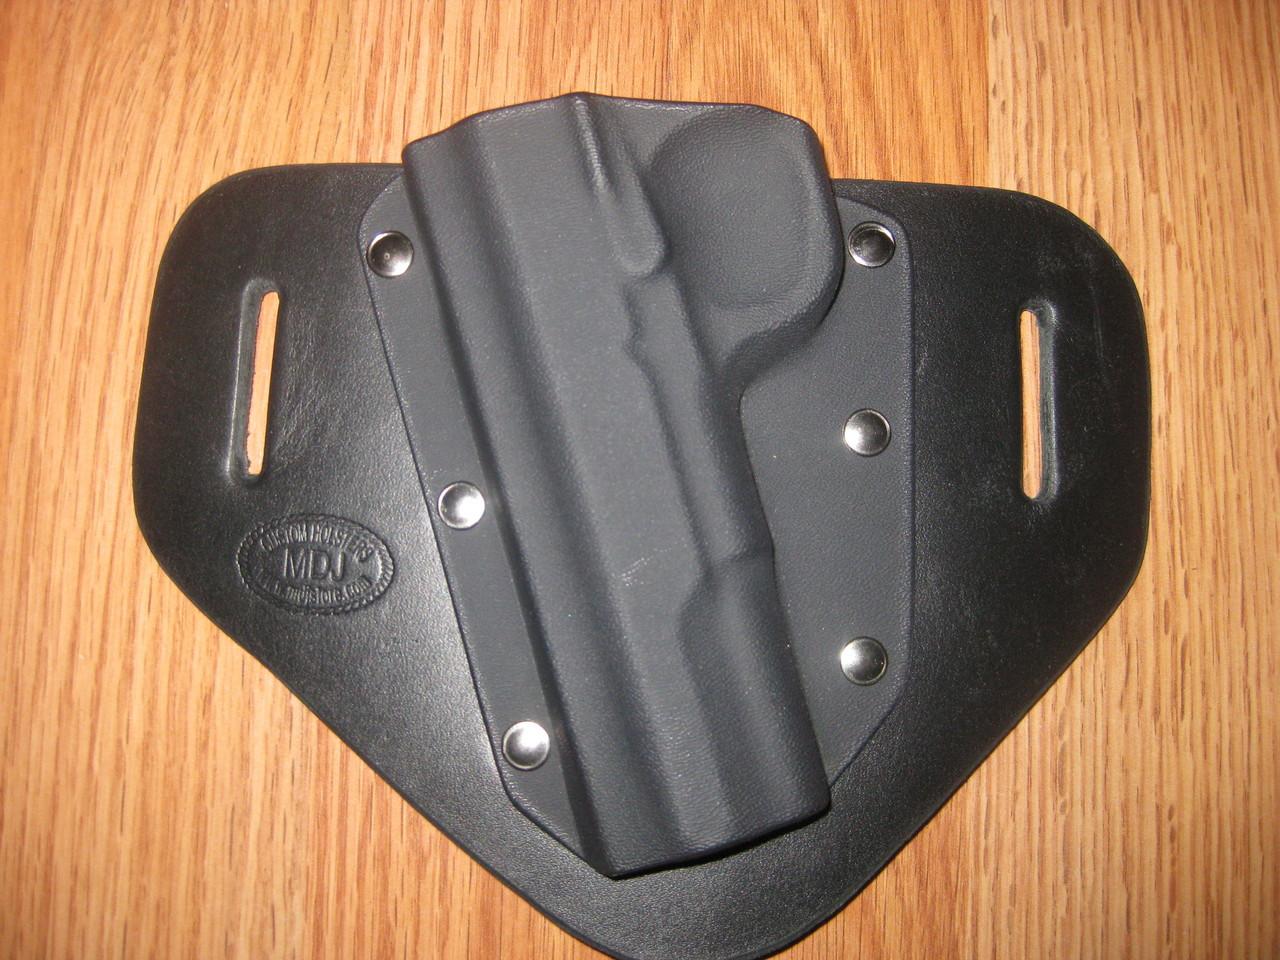 KELTEC OWB standard hybrid leather\Kydex Holster (fixed retention)